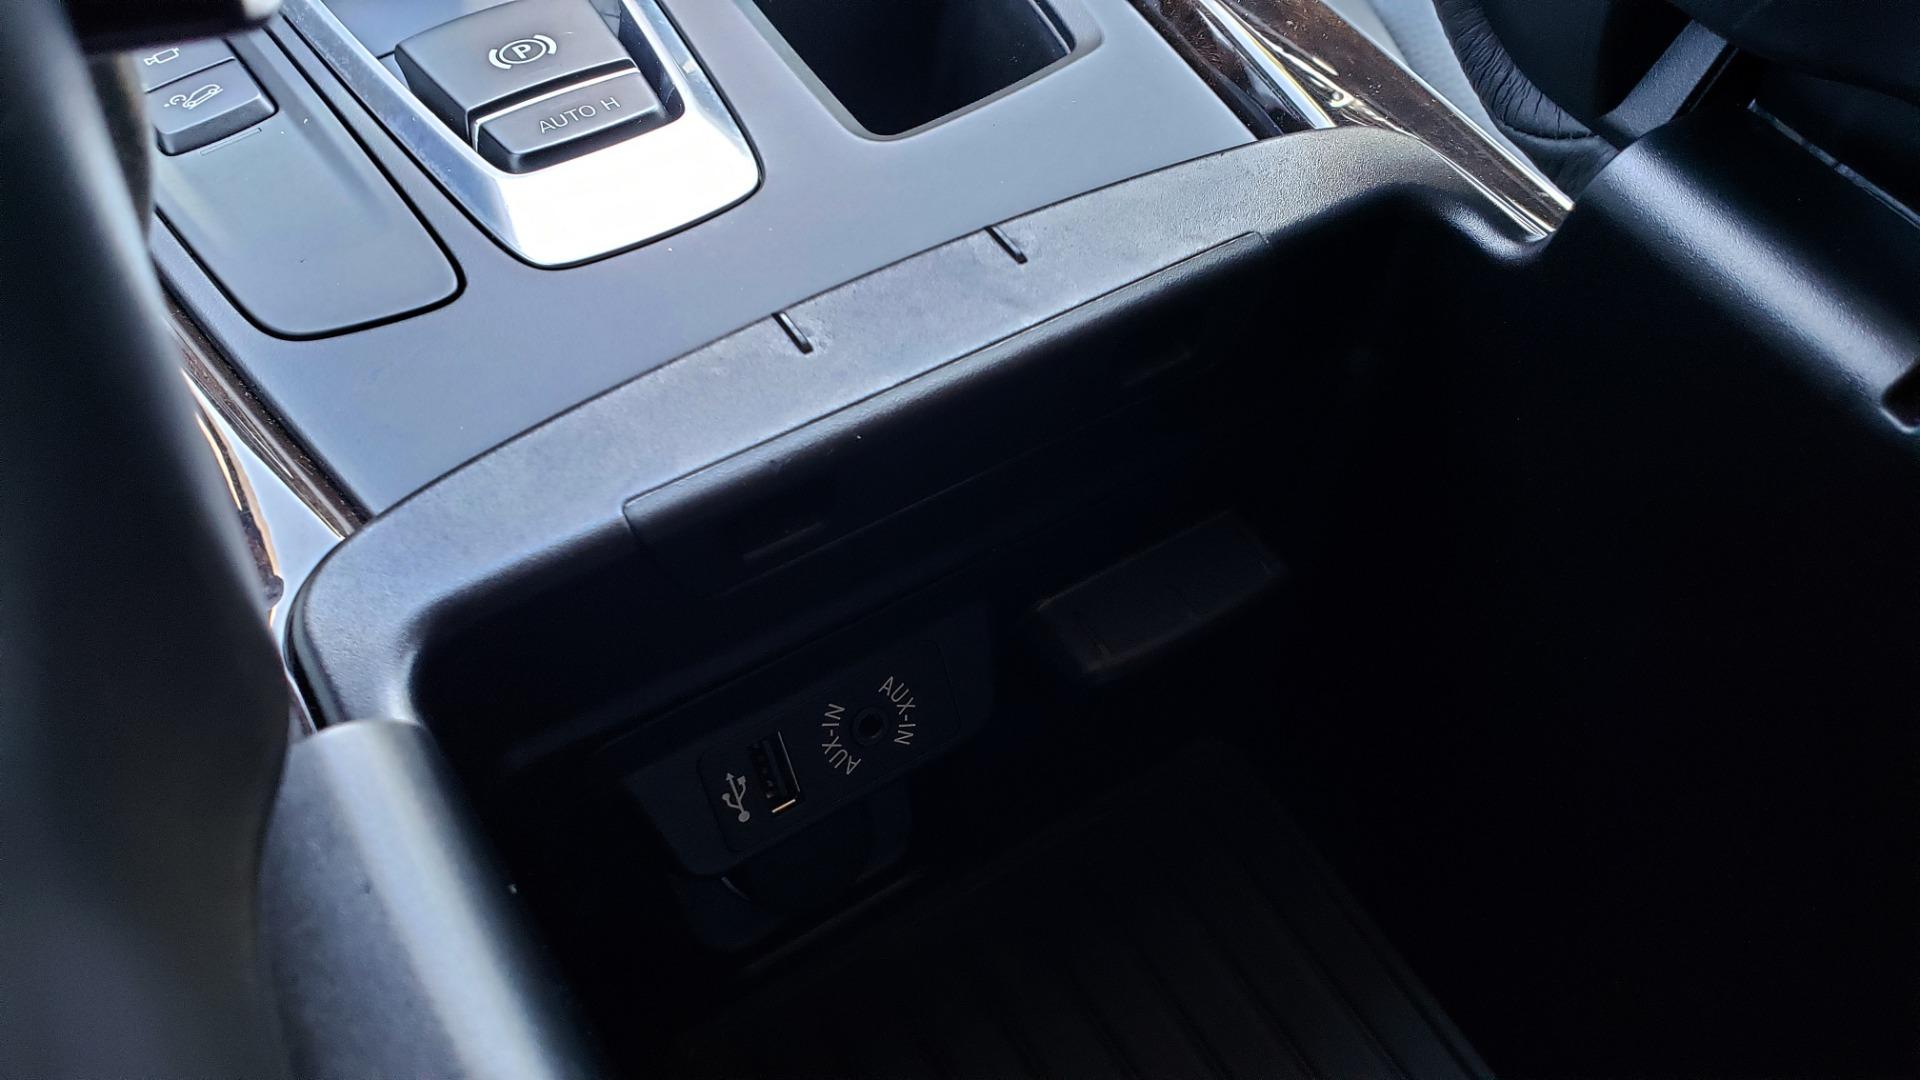 Used 2016 BMW X5 XDRIVE35I / PREM PKG / NAV / DRVR ASST PLUS / REARVIEW for sale $25,765 at Formula Imports in Charlotte NC 28227 60